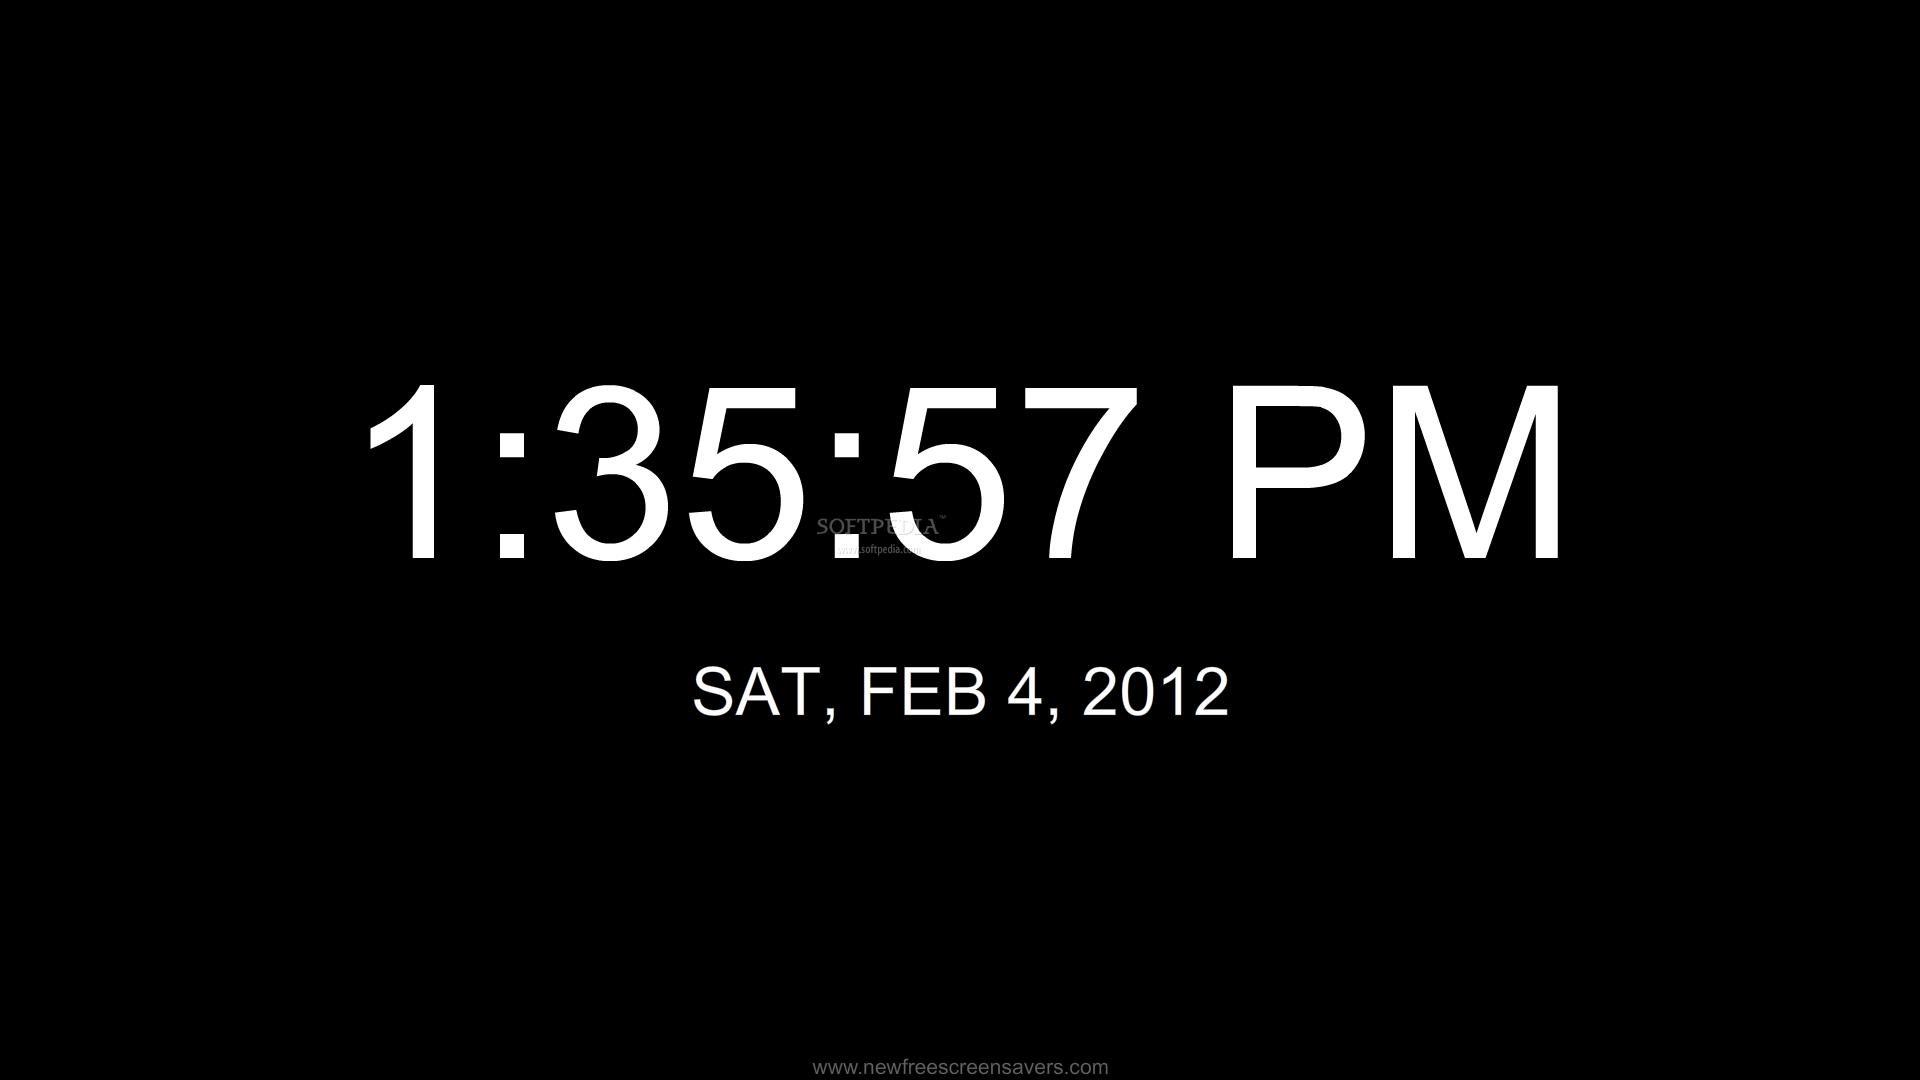 numbers from a portable digital trustedsep clock a digital clockid 1920x1080